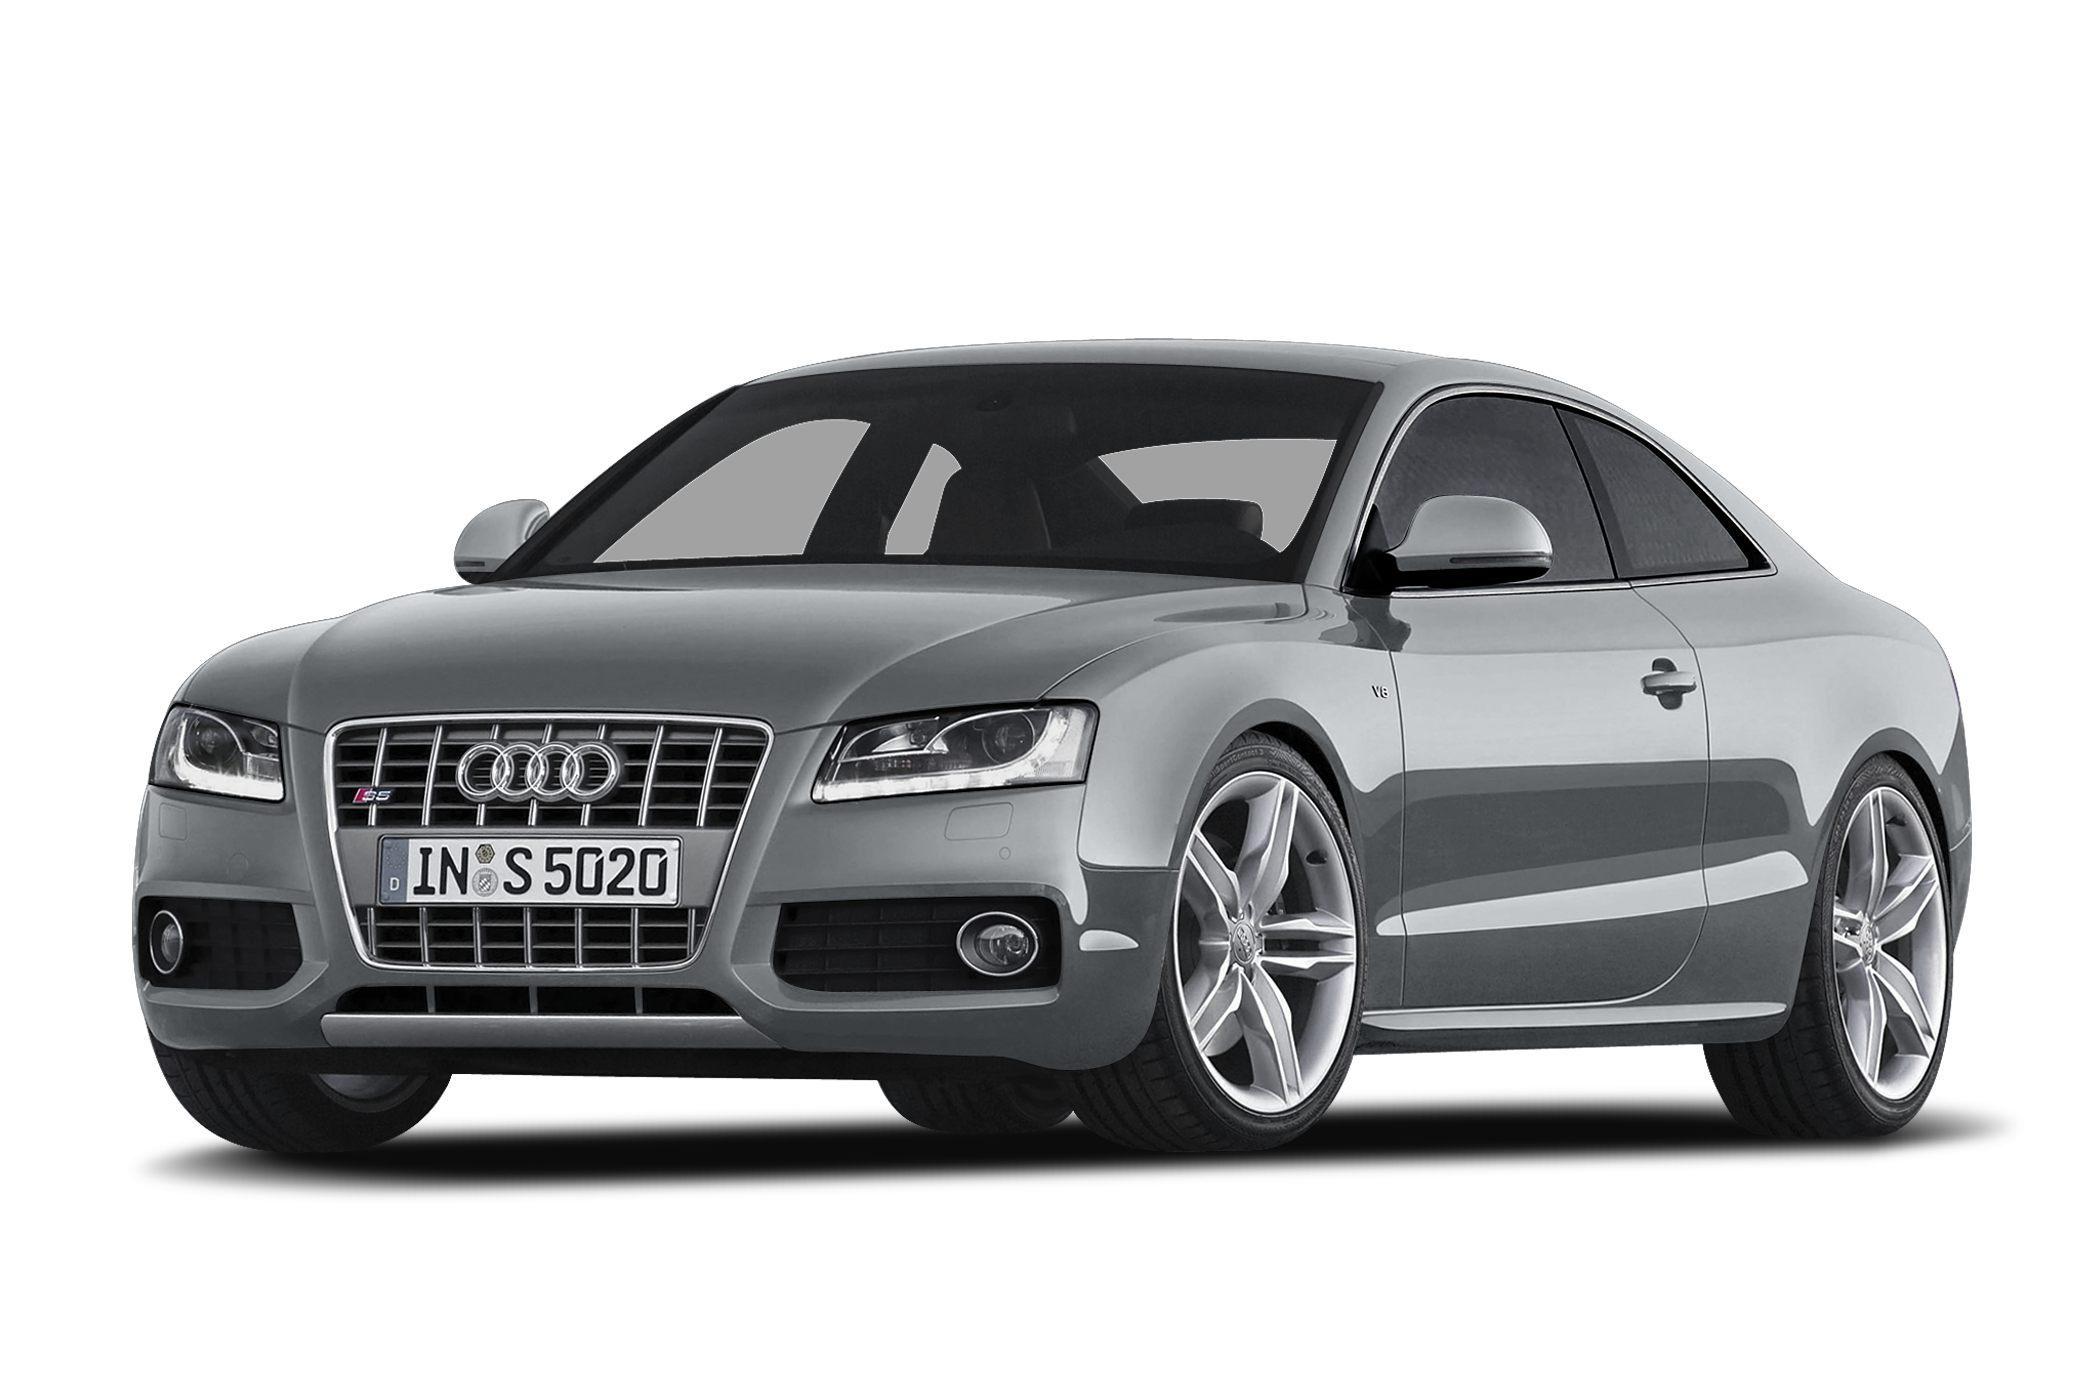 2009 Audi S5 Information